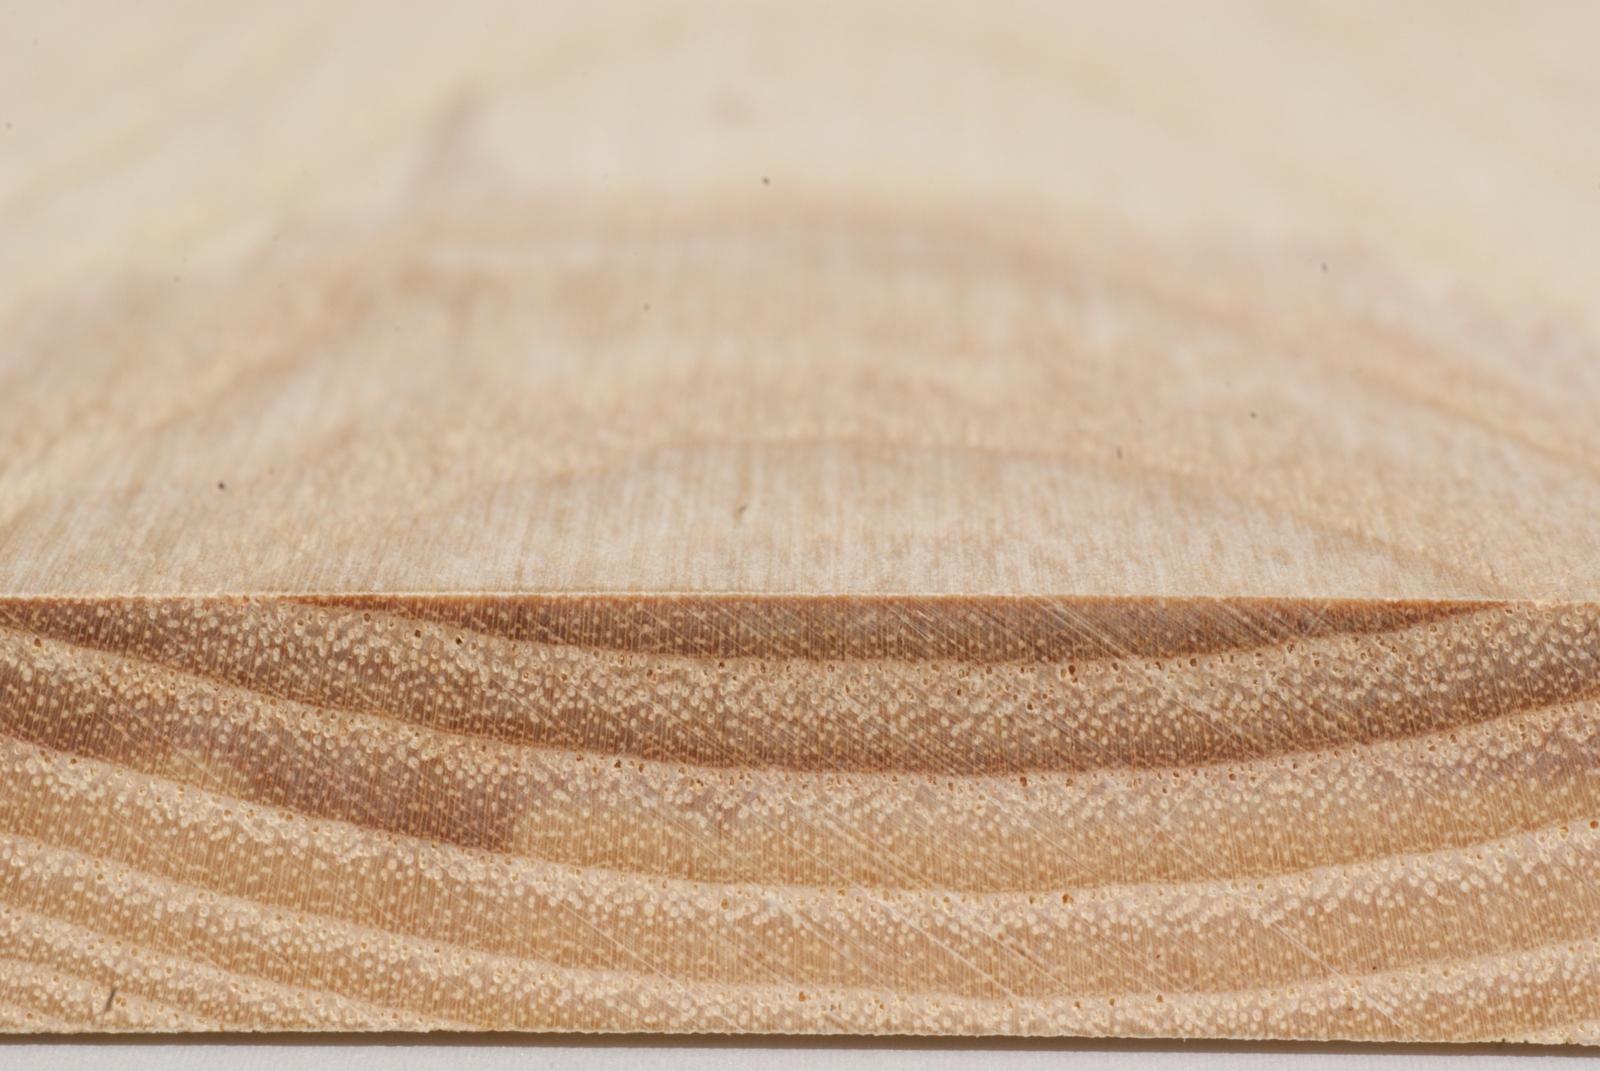 Esche Merkmale Eigenschaften Holz Vom Fach